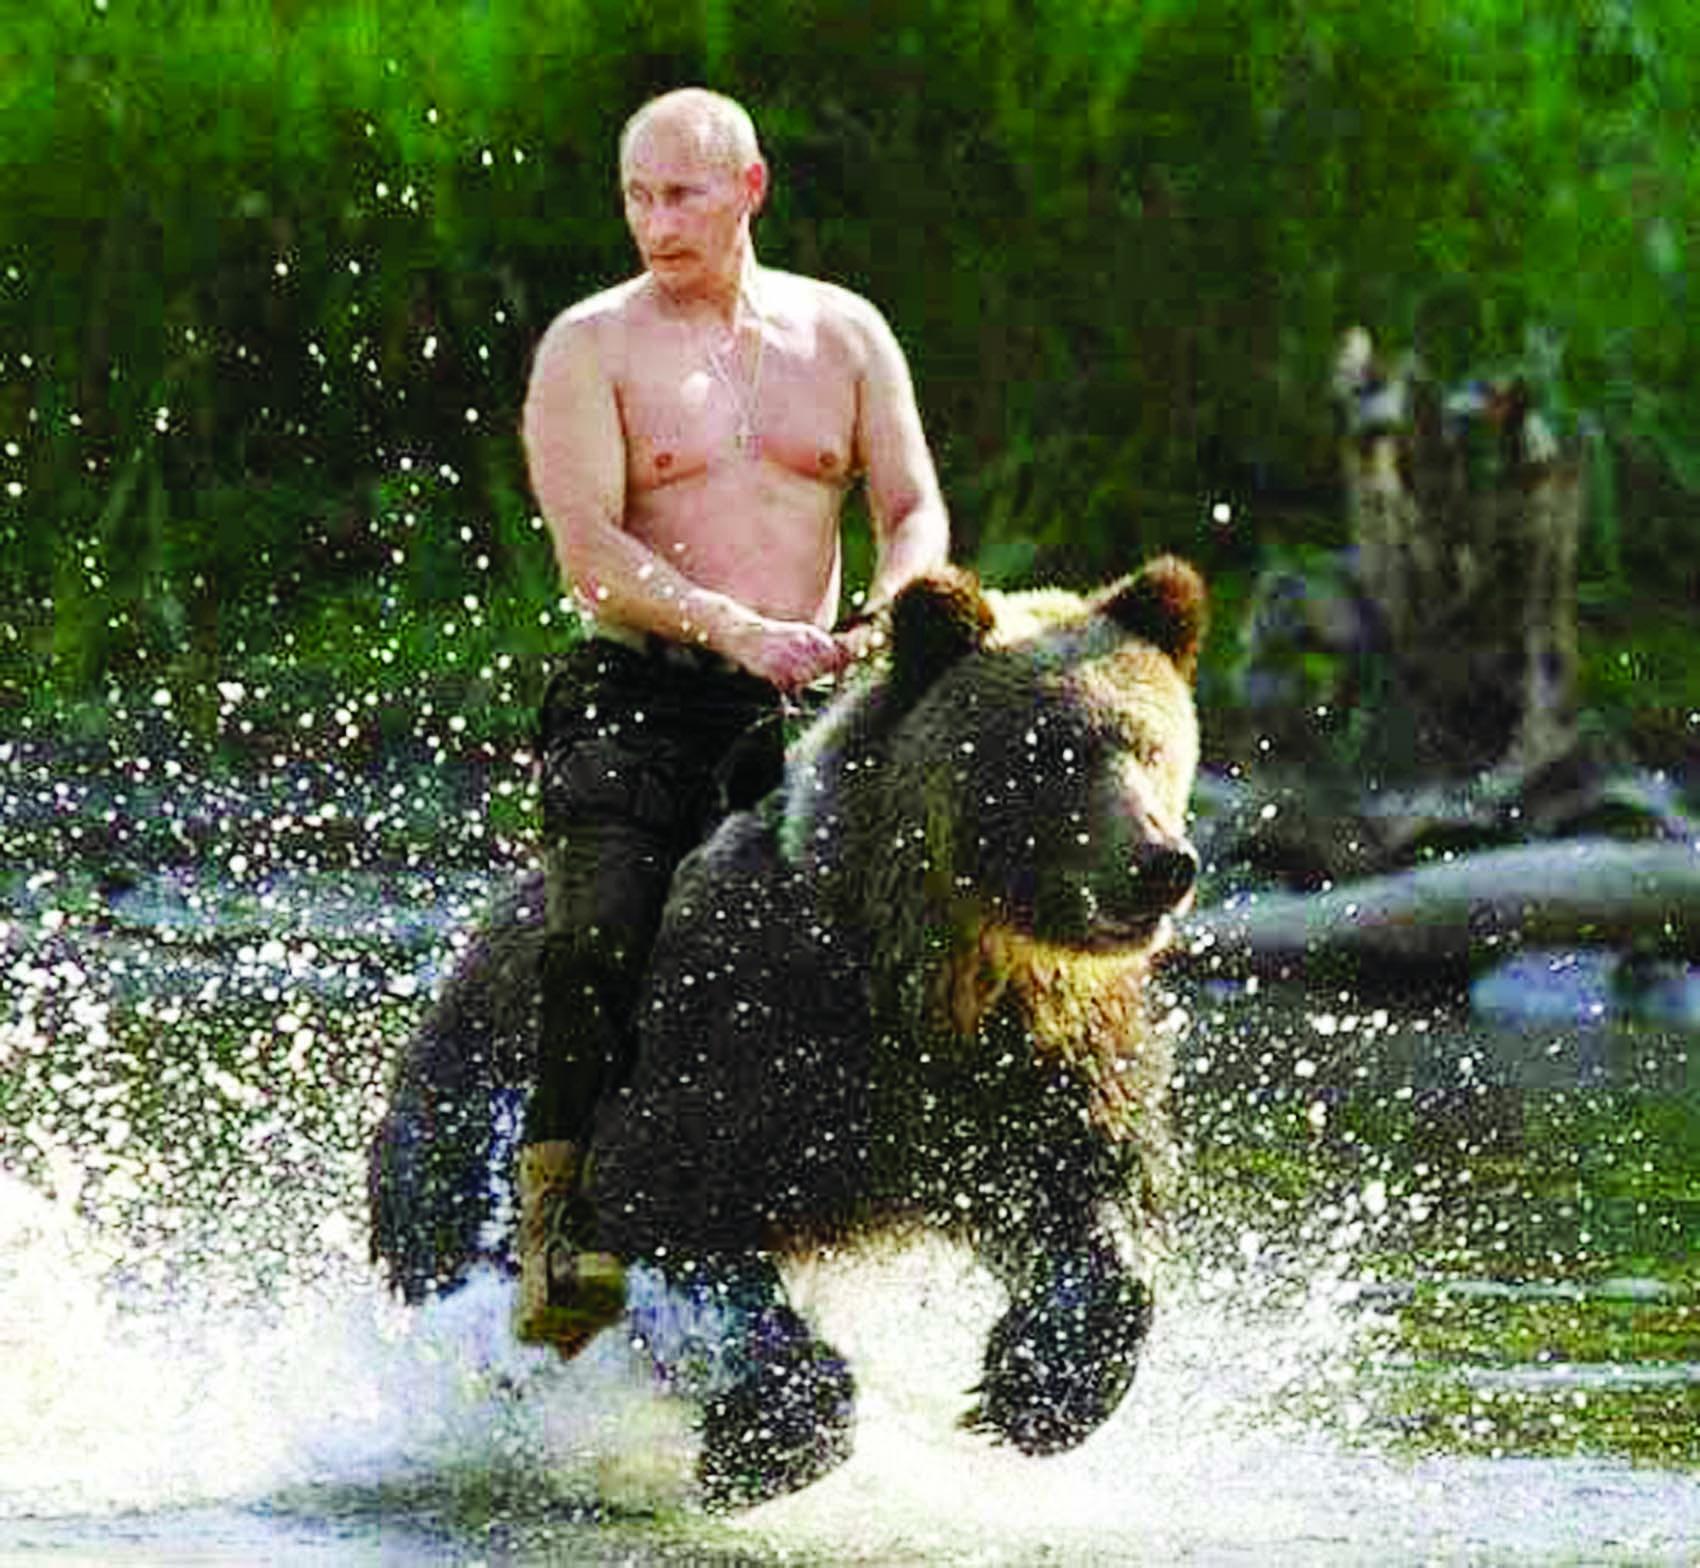 Putin goes shirtless for new 2016 calendar